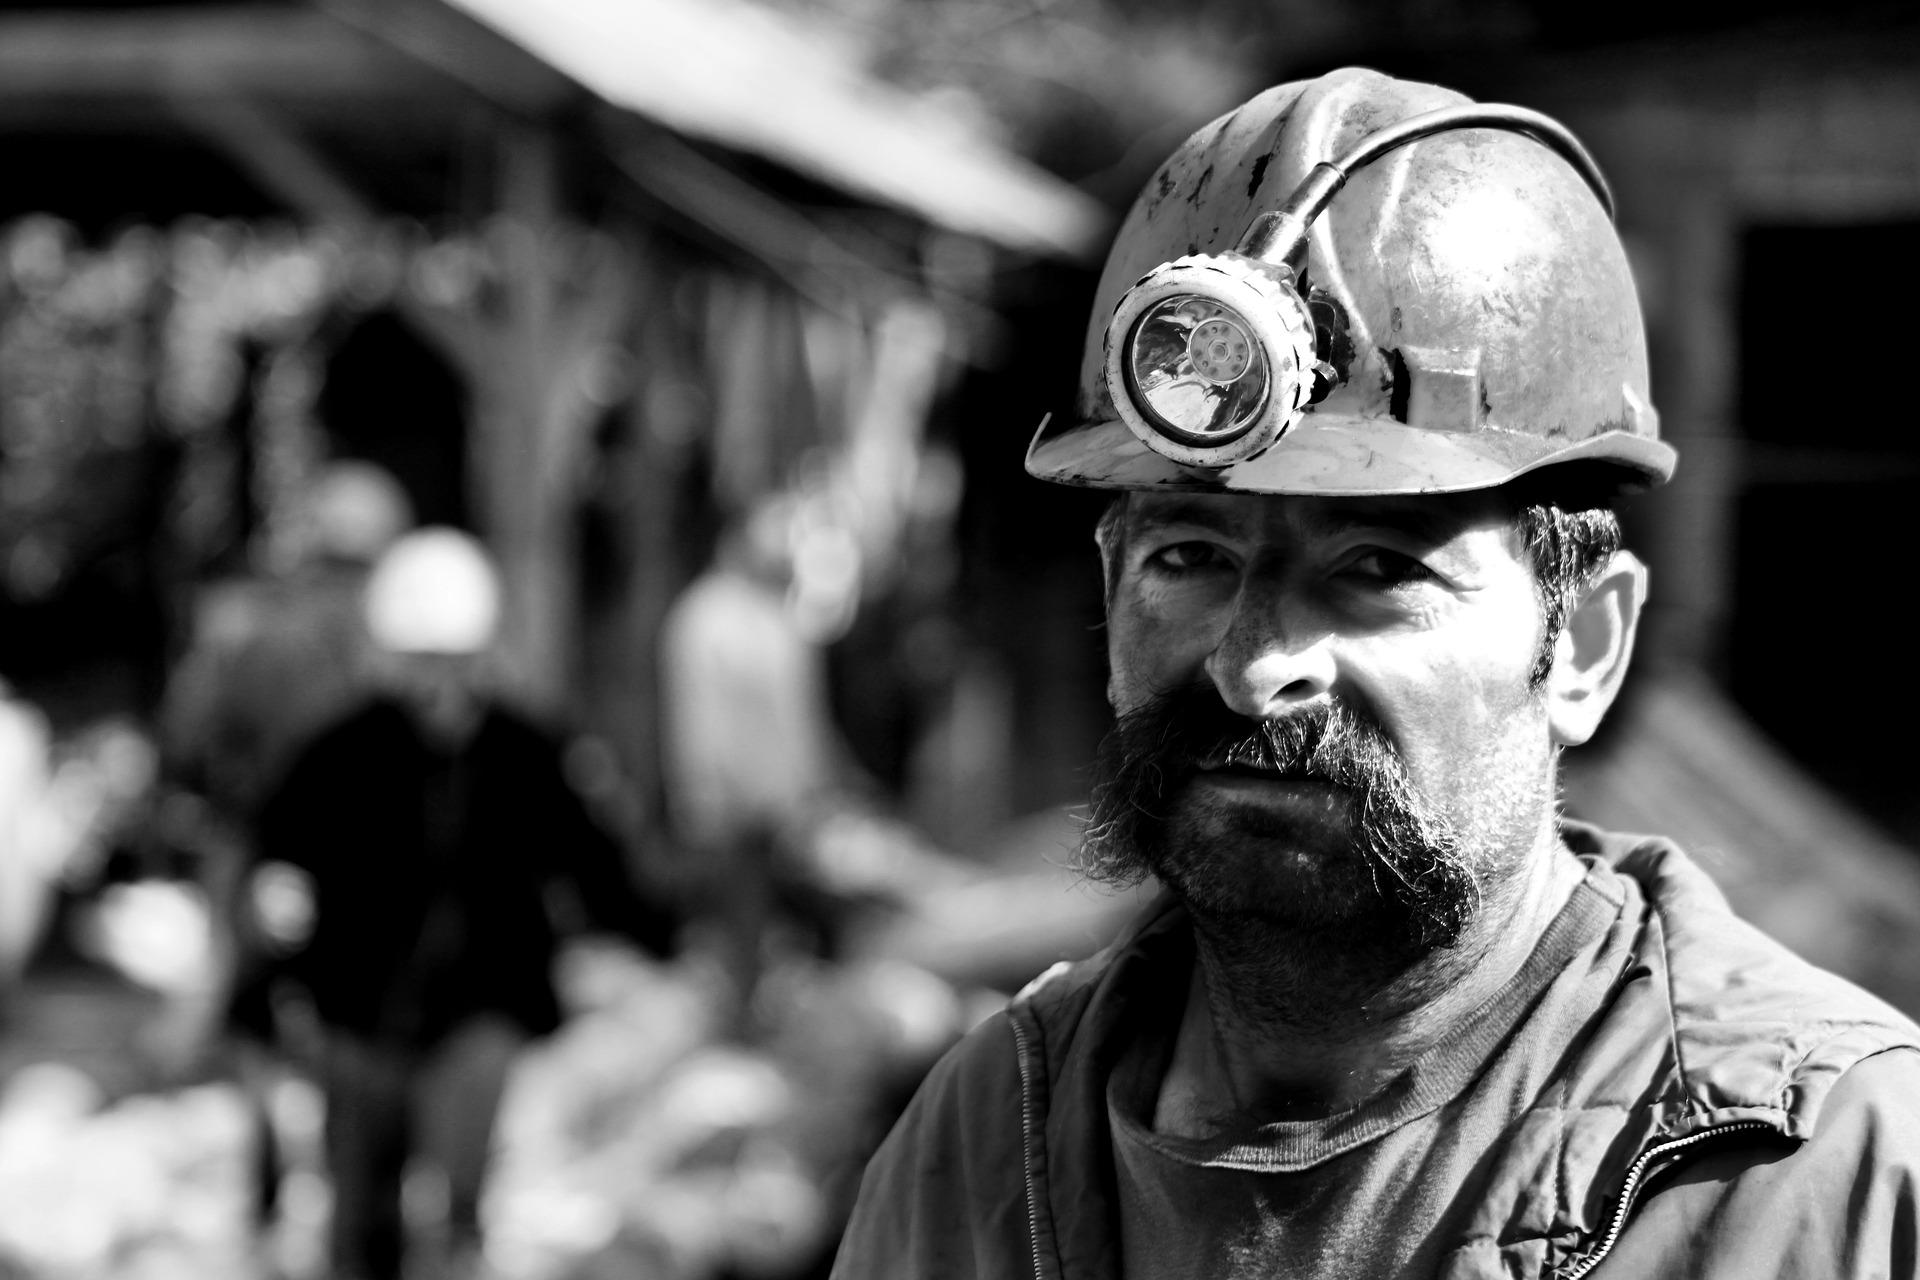 Coal miner Hazardous Jobs